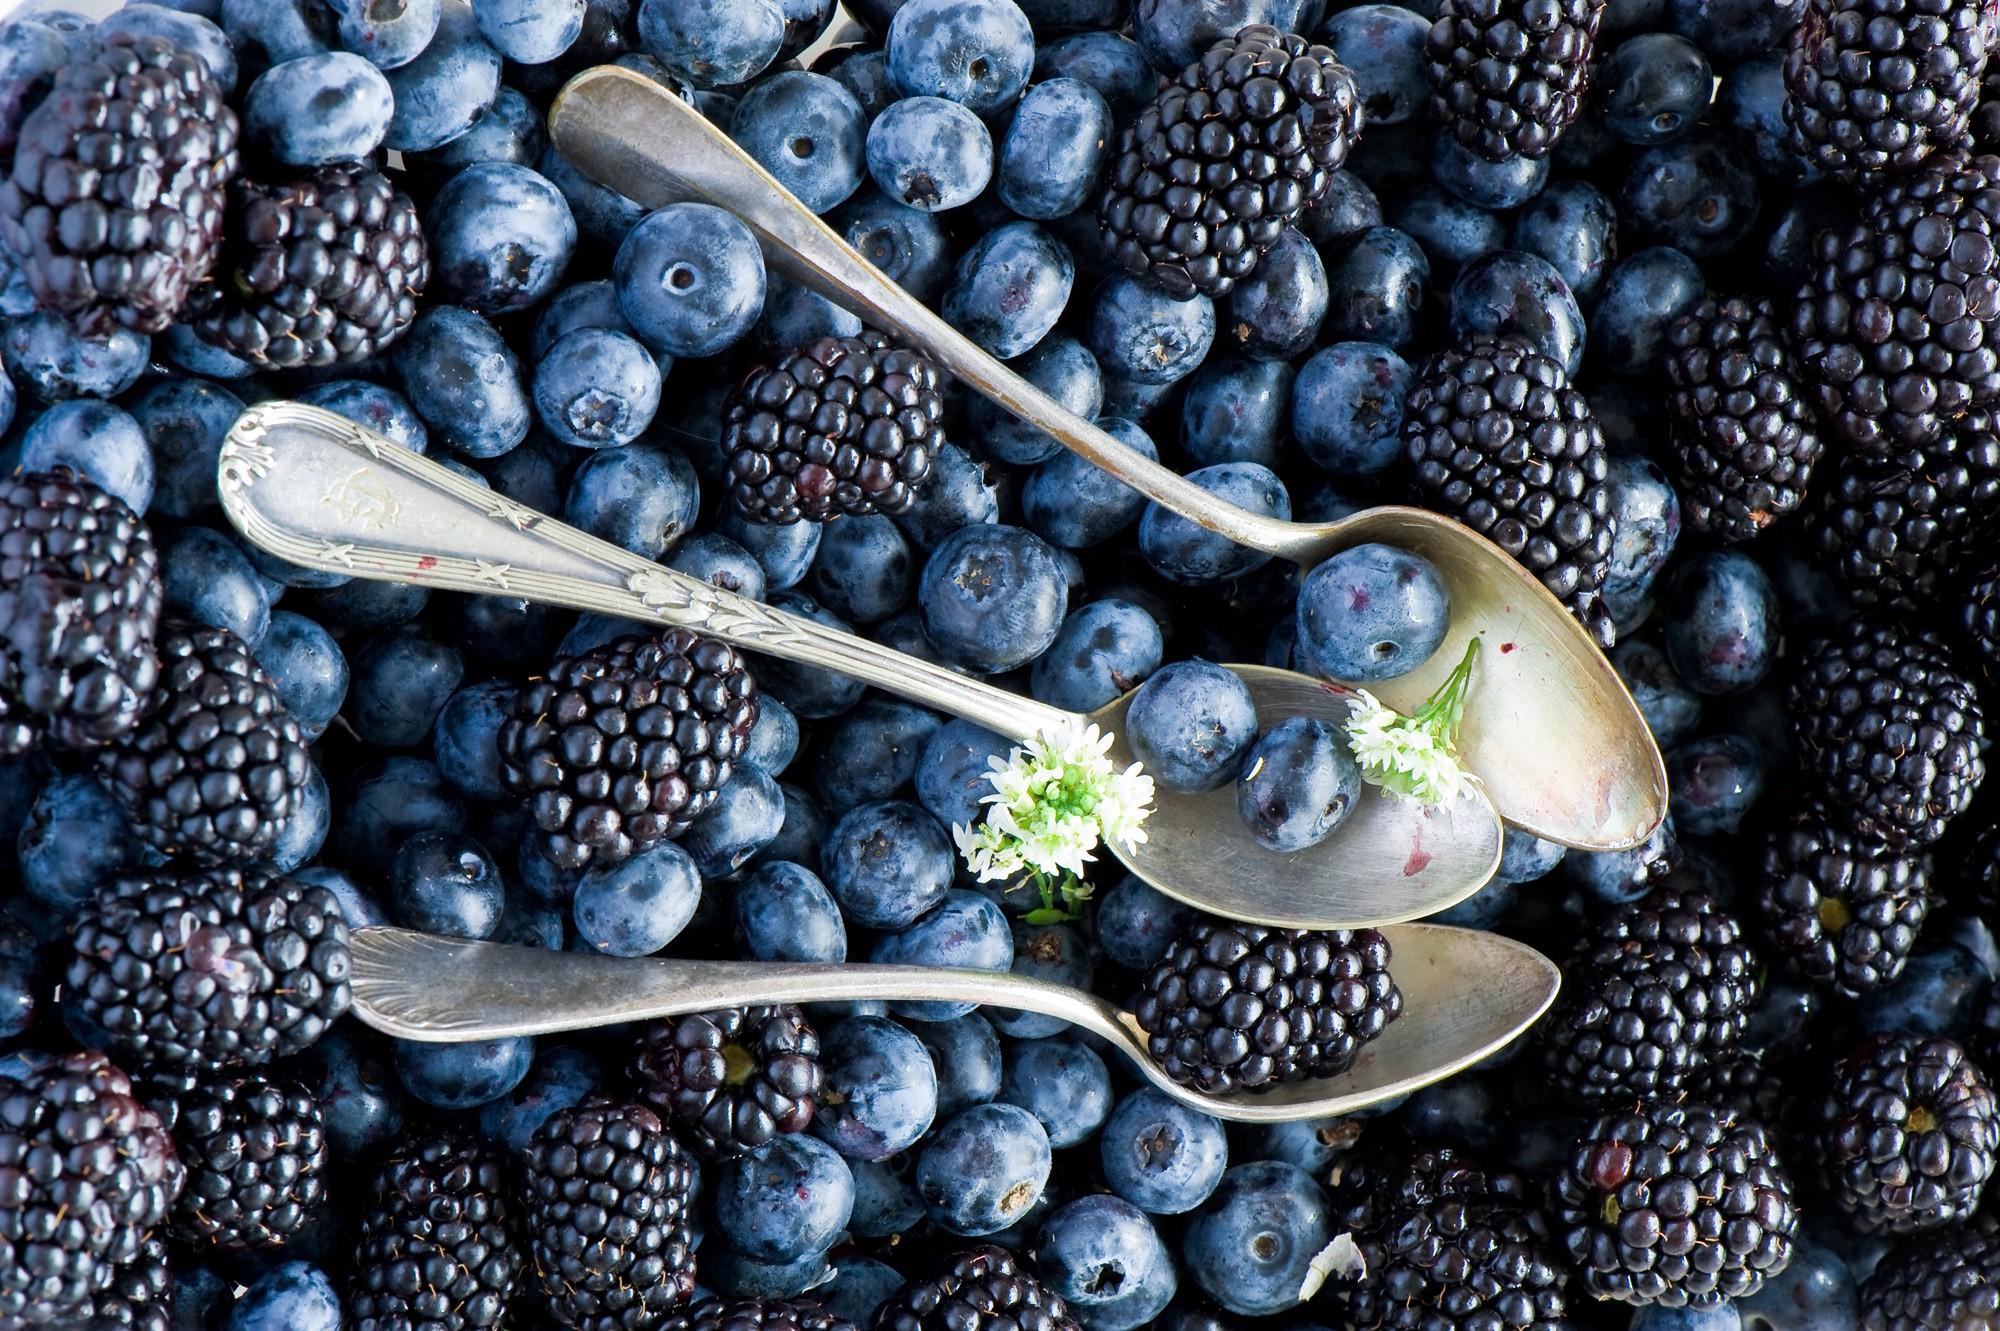 Spoons including blueberries and blackberries wallpapers ...